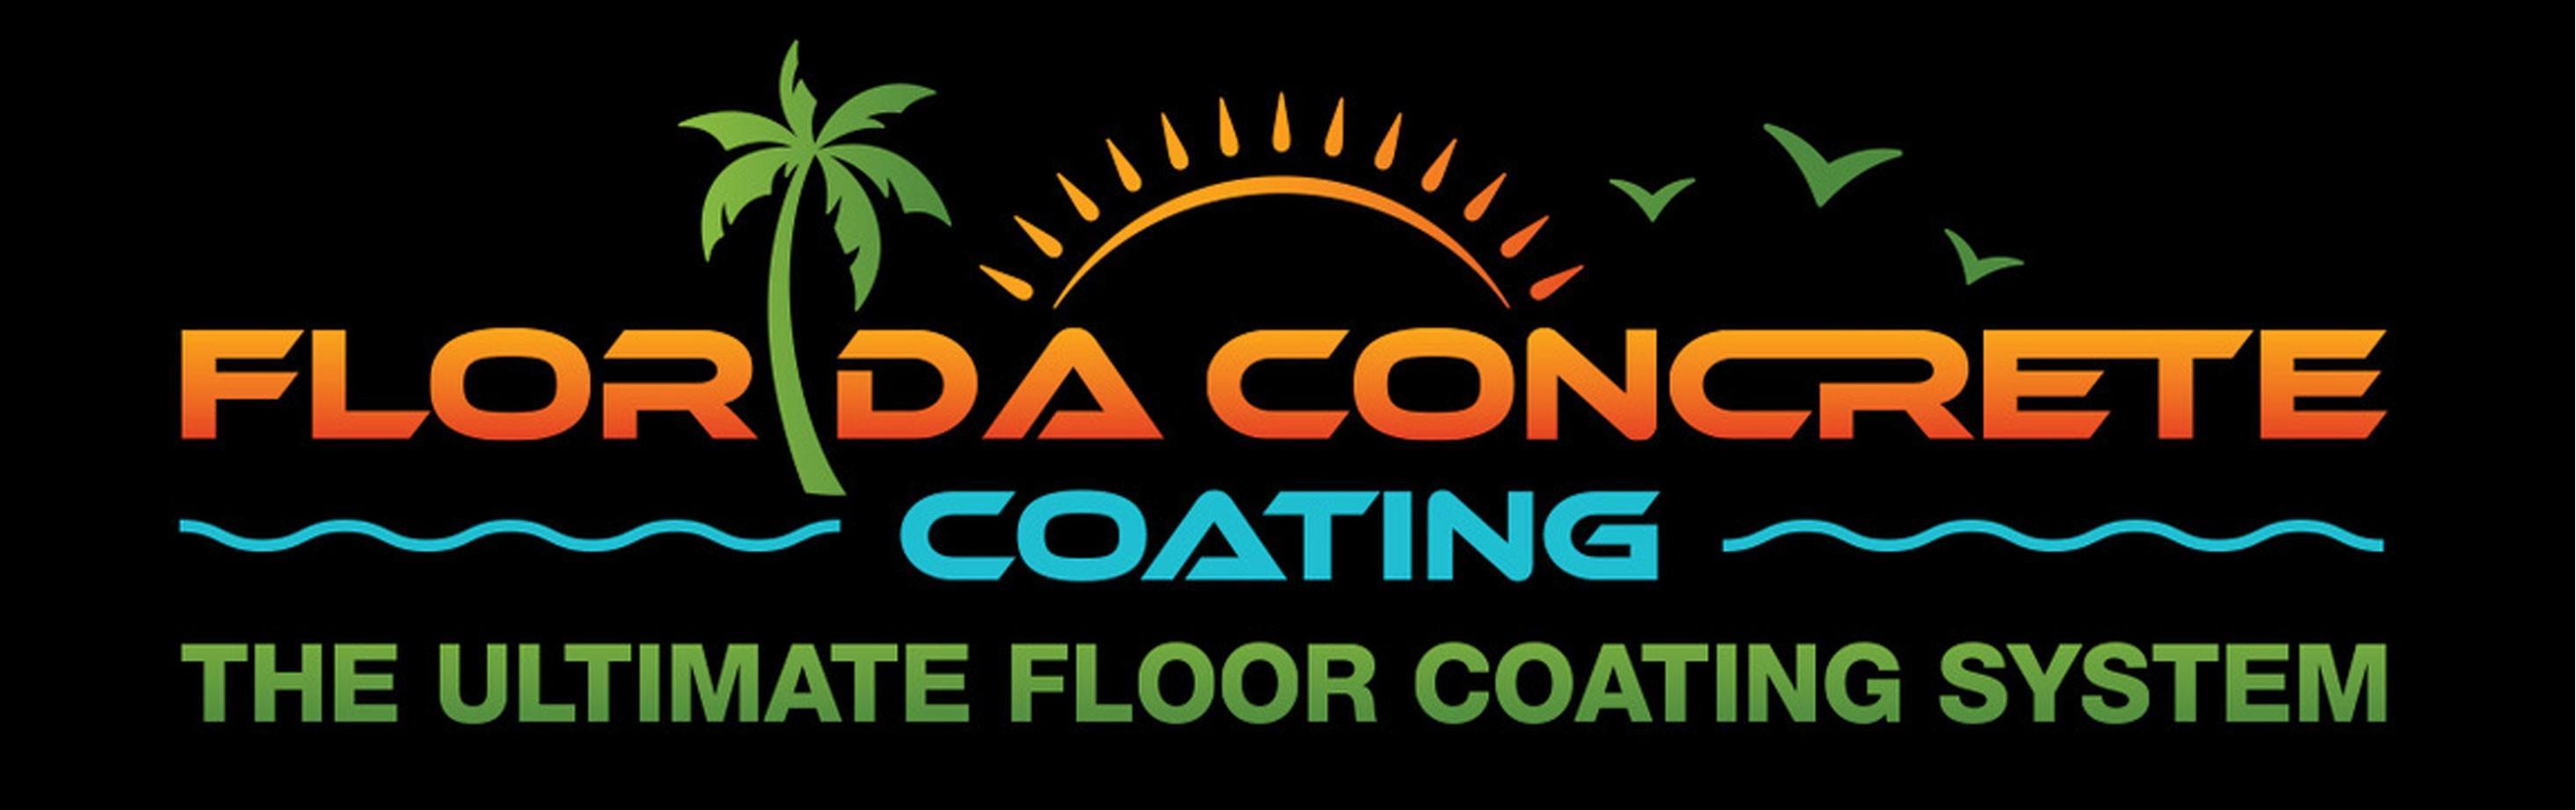 Florida-Concrete-Coatings-BLACK.jpg